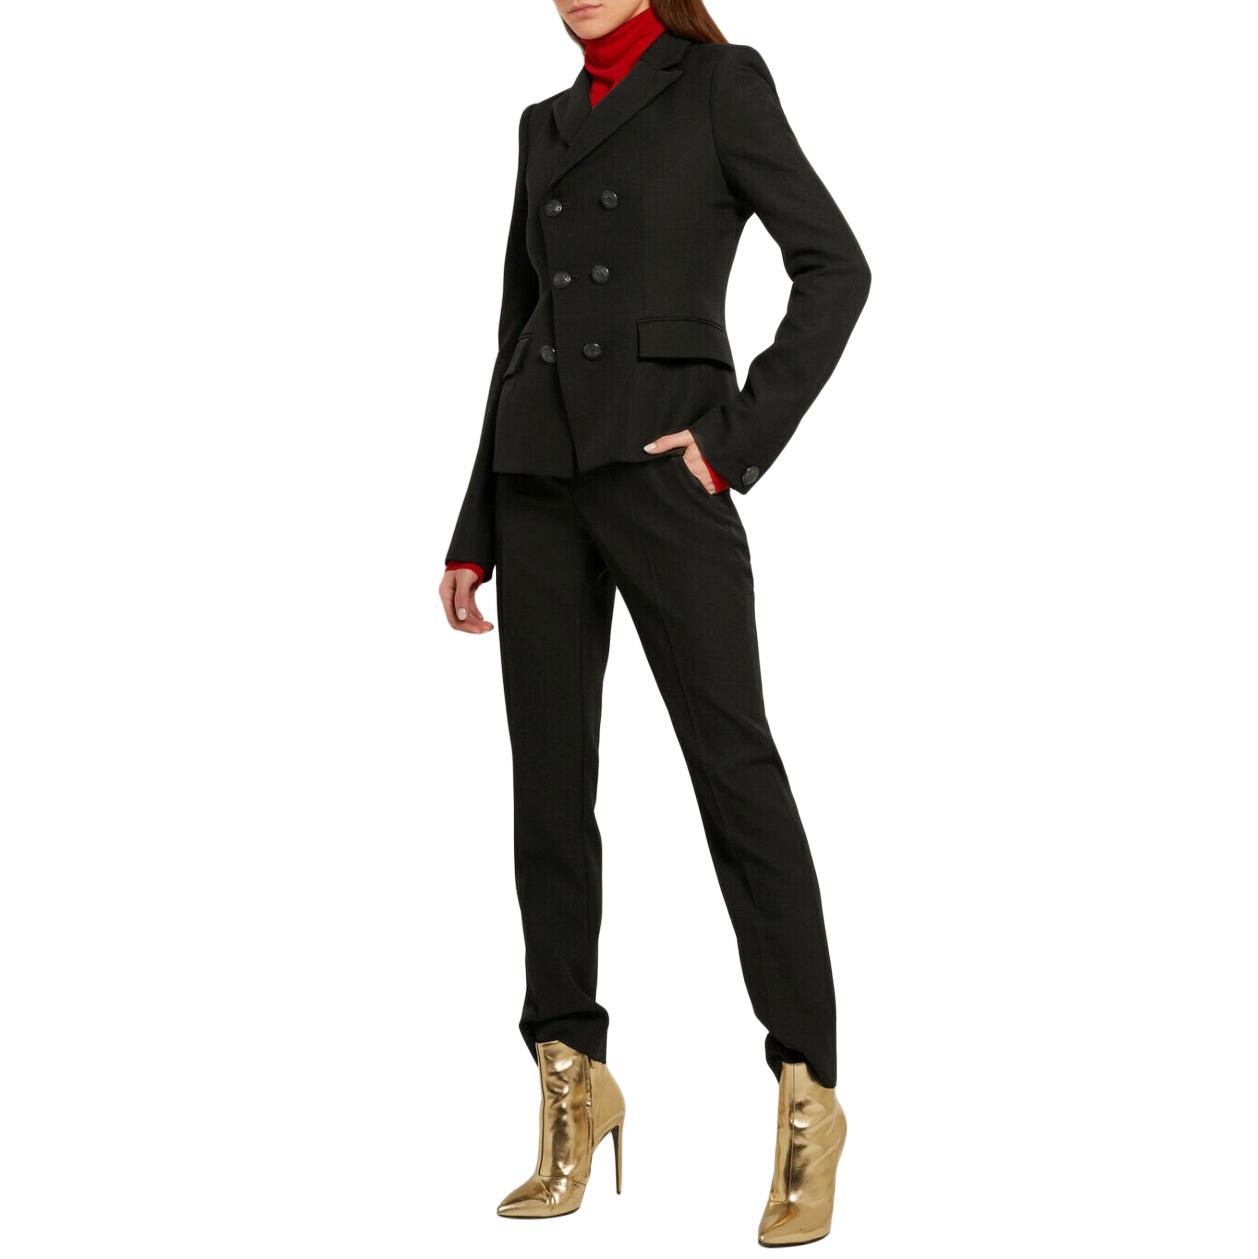 Balenciaga Black Double Breasted Hourglass Jacket